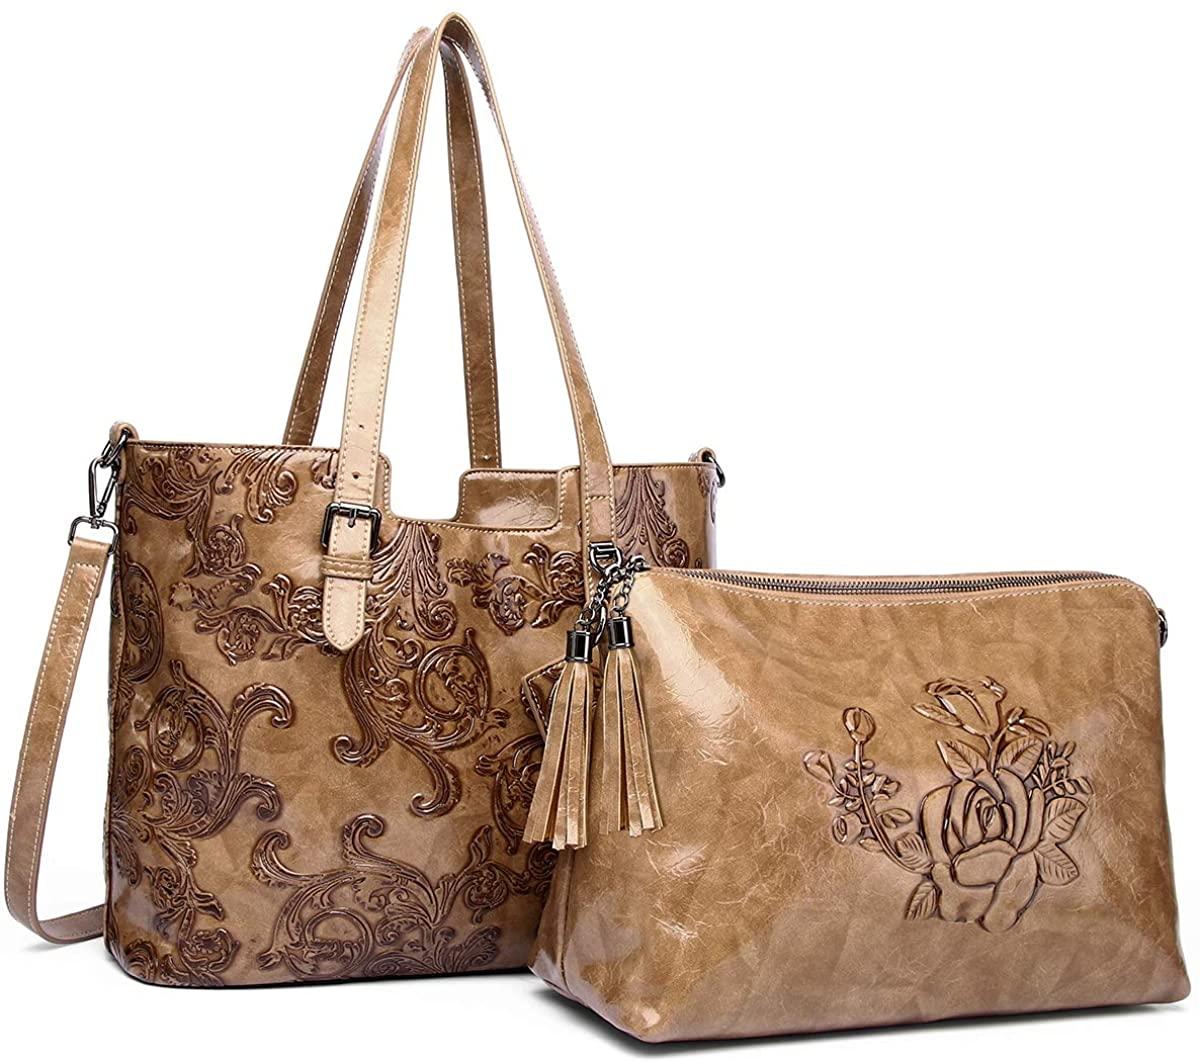 Women Tote Bag Cross-body Cellphone Purse Embossed Top Handle Handbags Large Ladies Satchel Shoulder Bags 2 Pcs Set 812